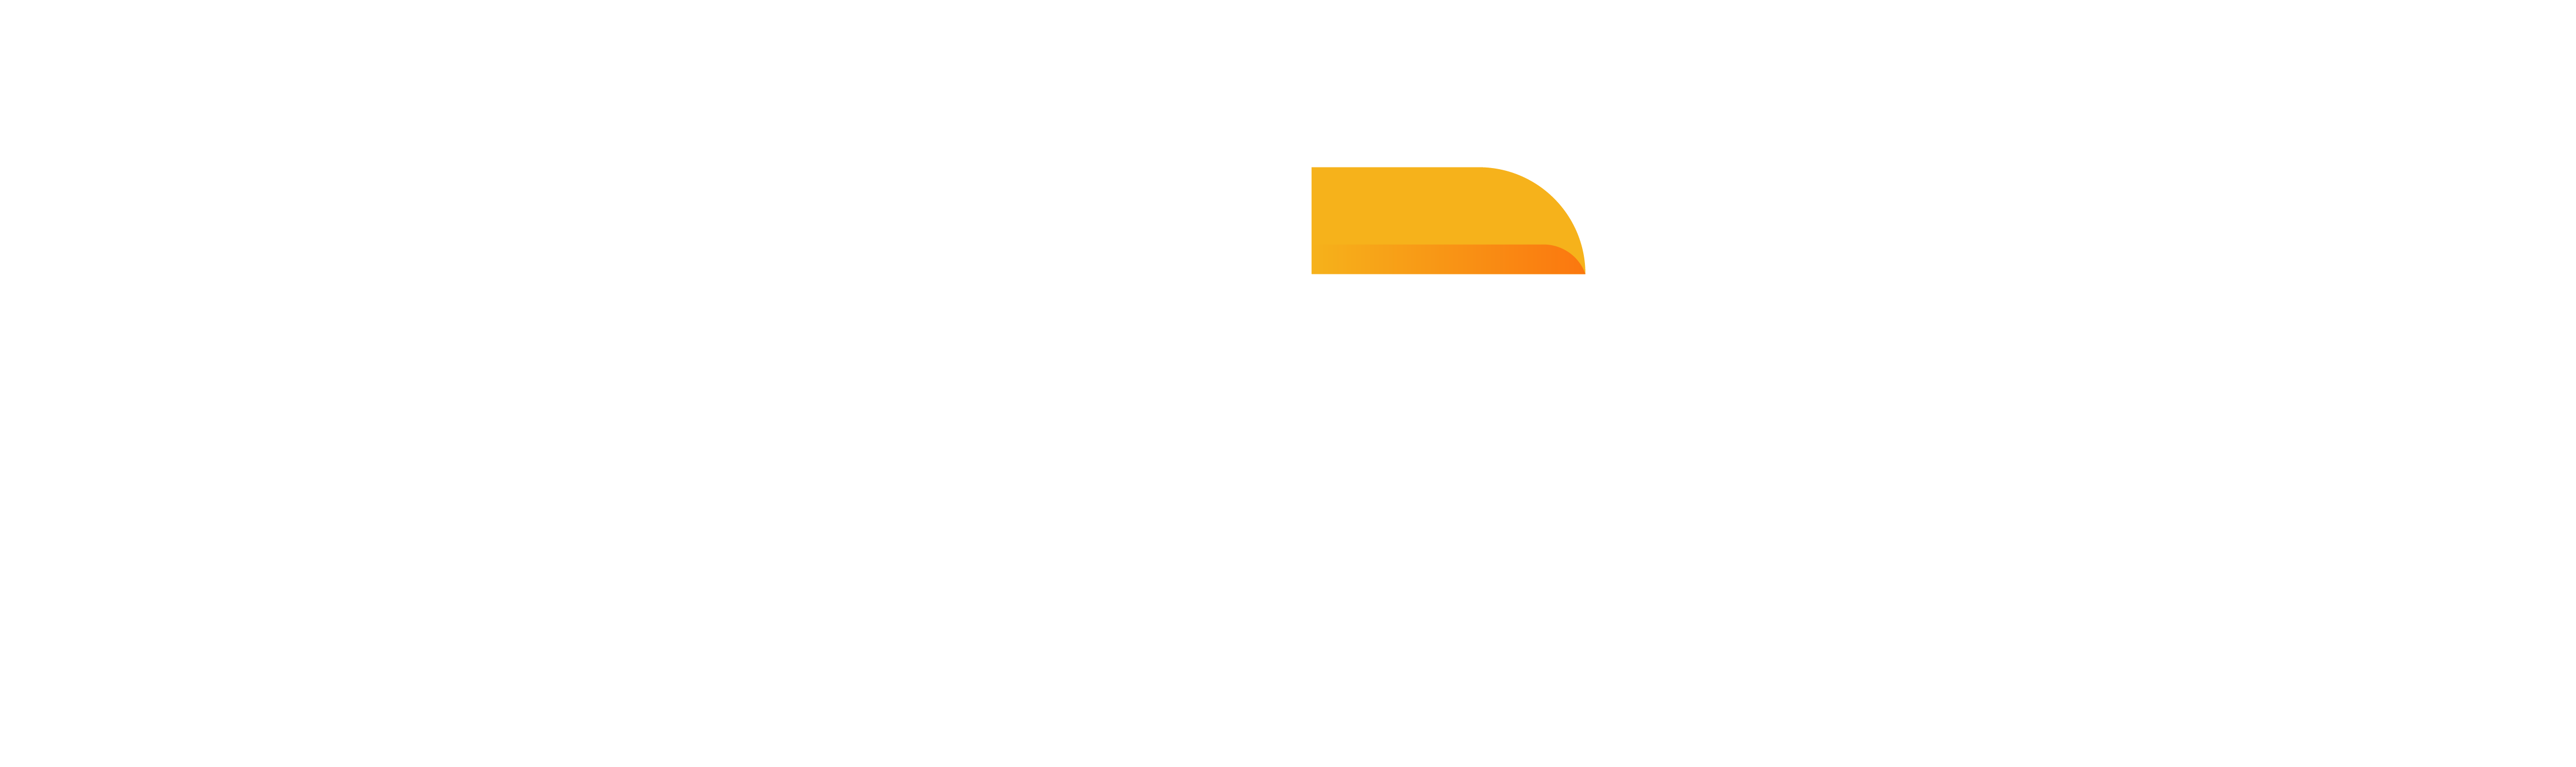 Sambeso | Nordisk Amazon Bureau